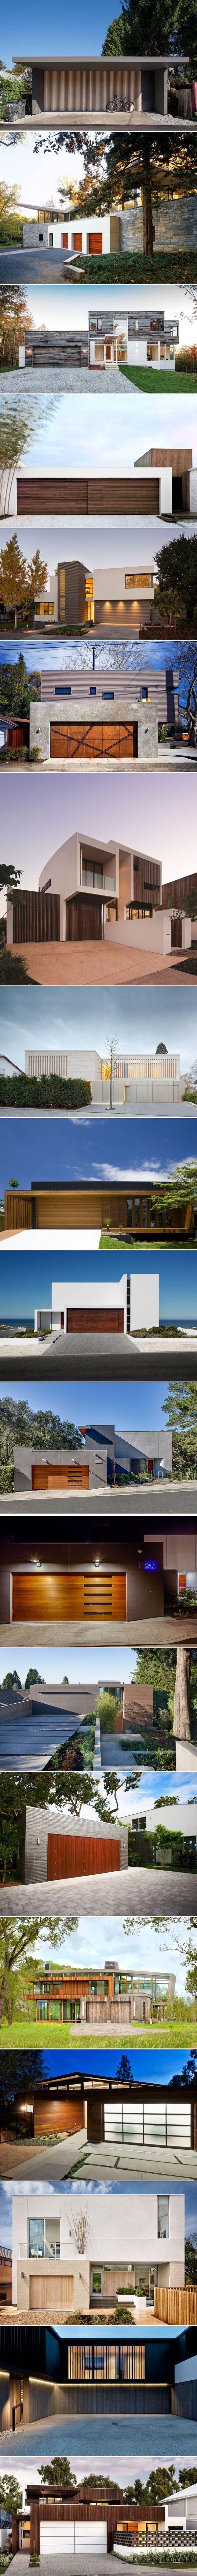 18 Inspirational Examples of Modern Garage Doors | CONTEMPORIST